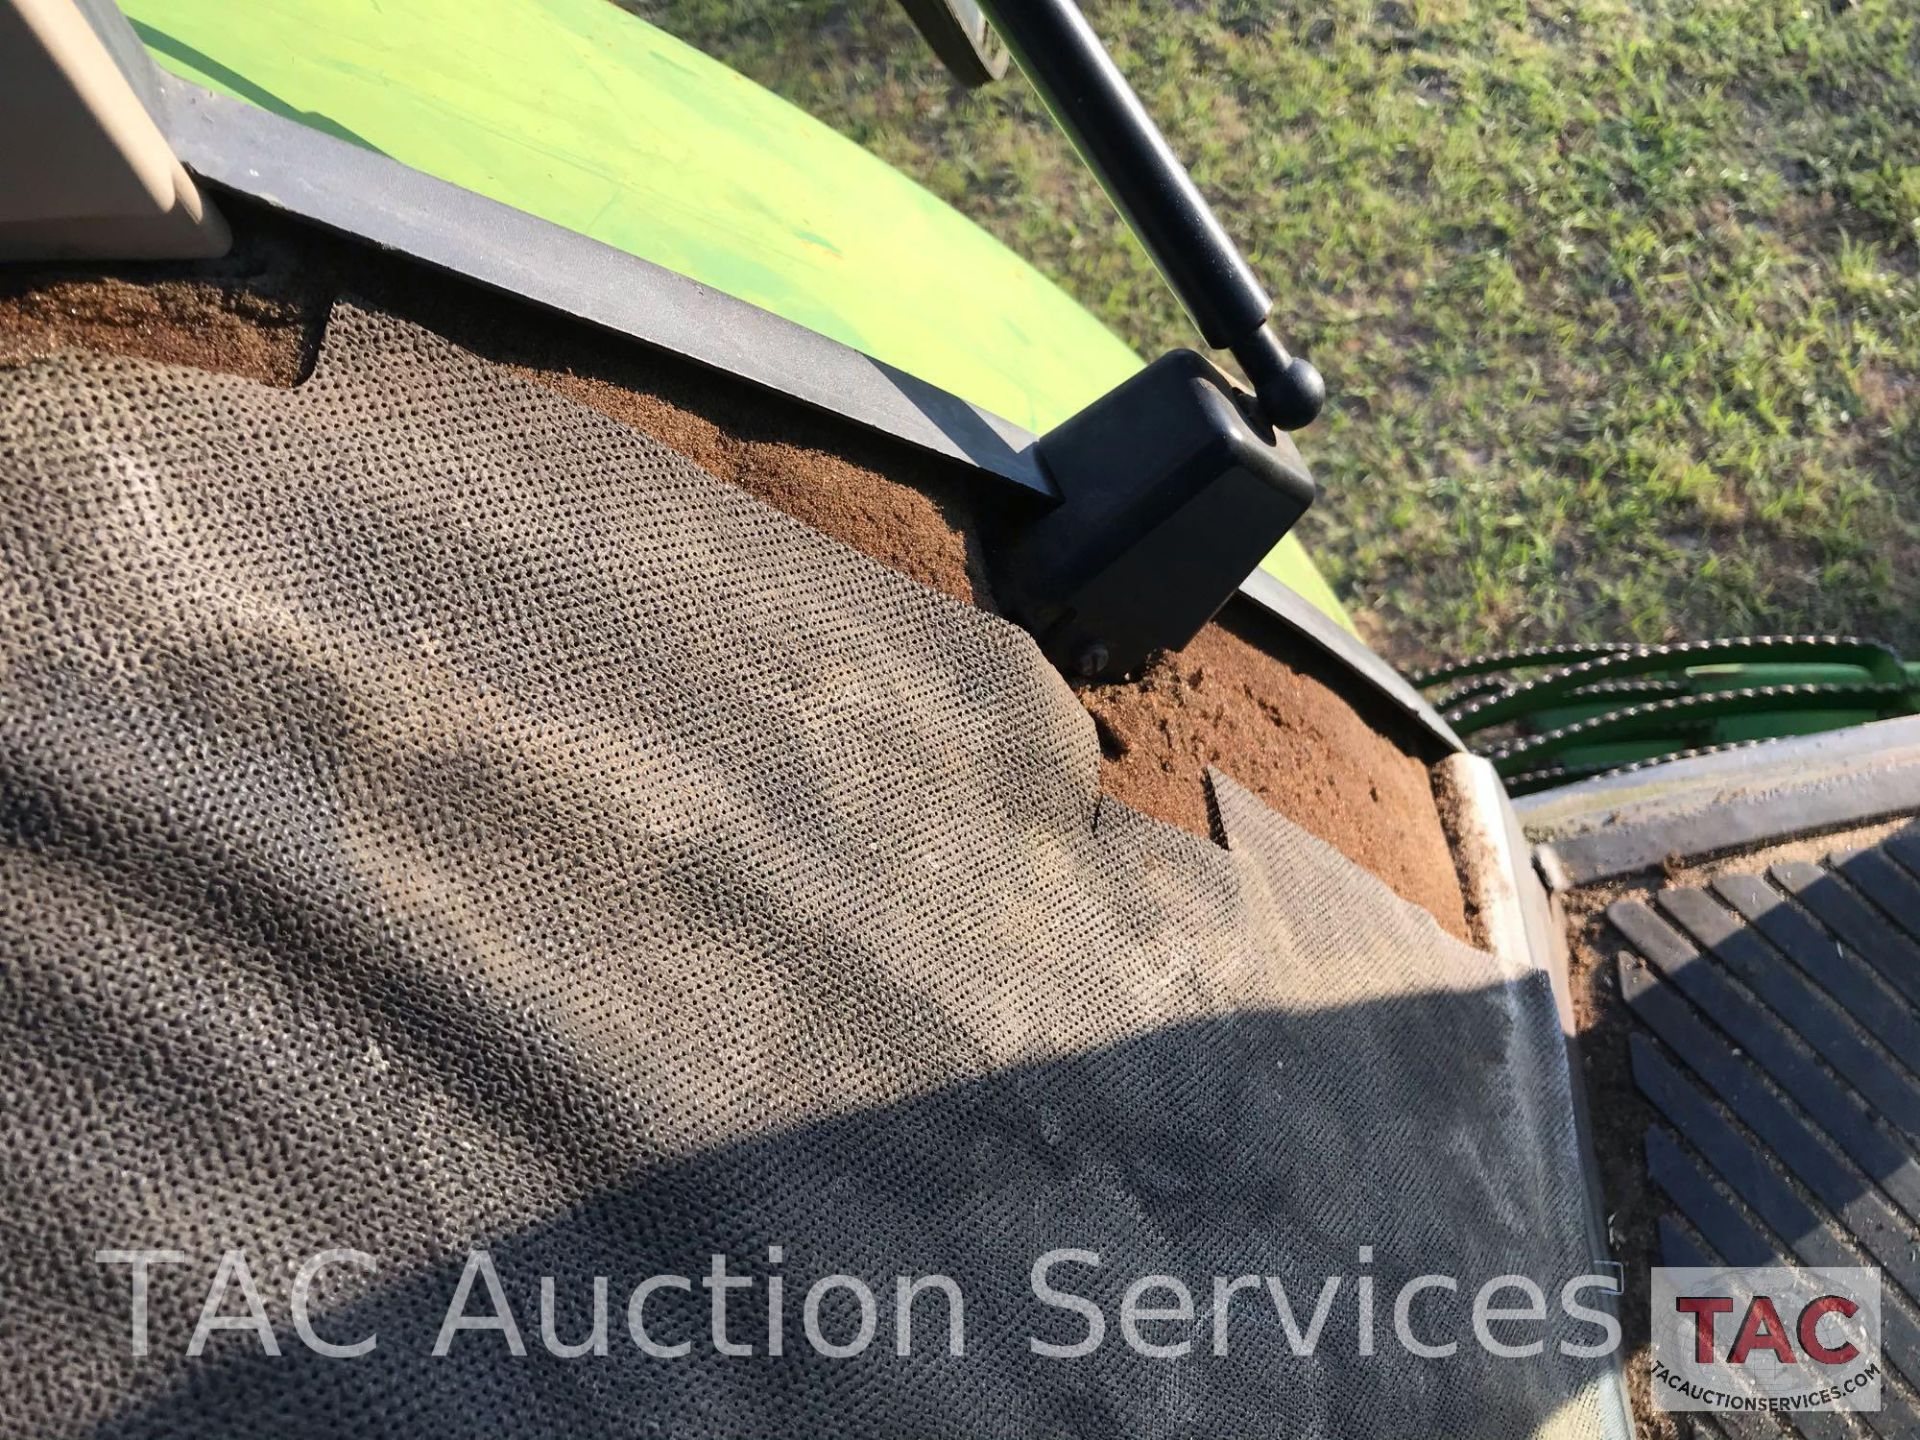 John Deere 7410 Farm Tractor - Image 13 of 24